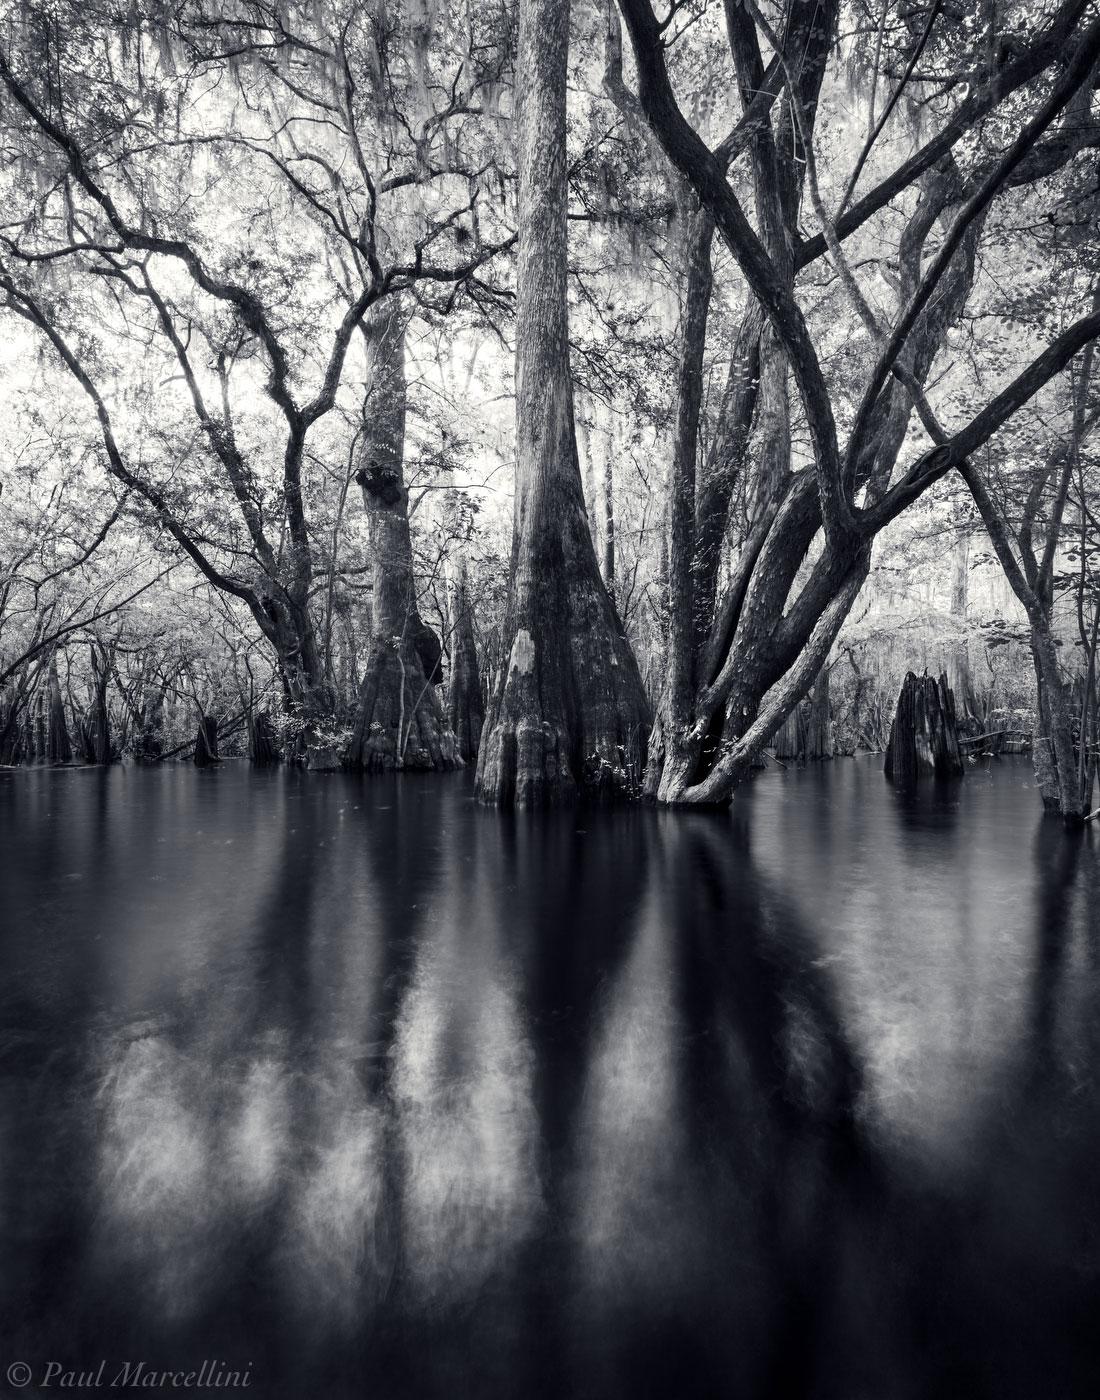 Suwannee River Valley, Florida, trees, backwaters, north florida, nature, photography, photo